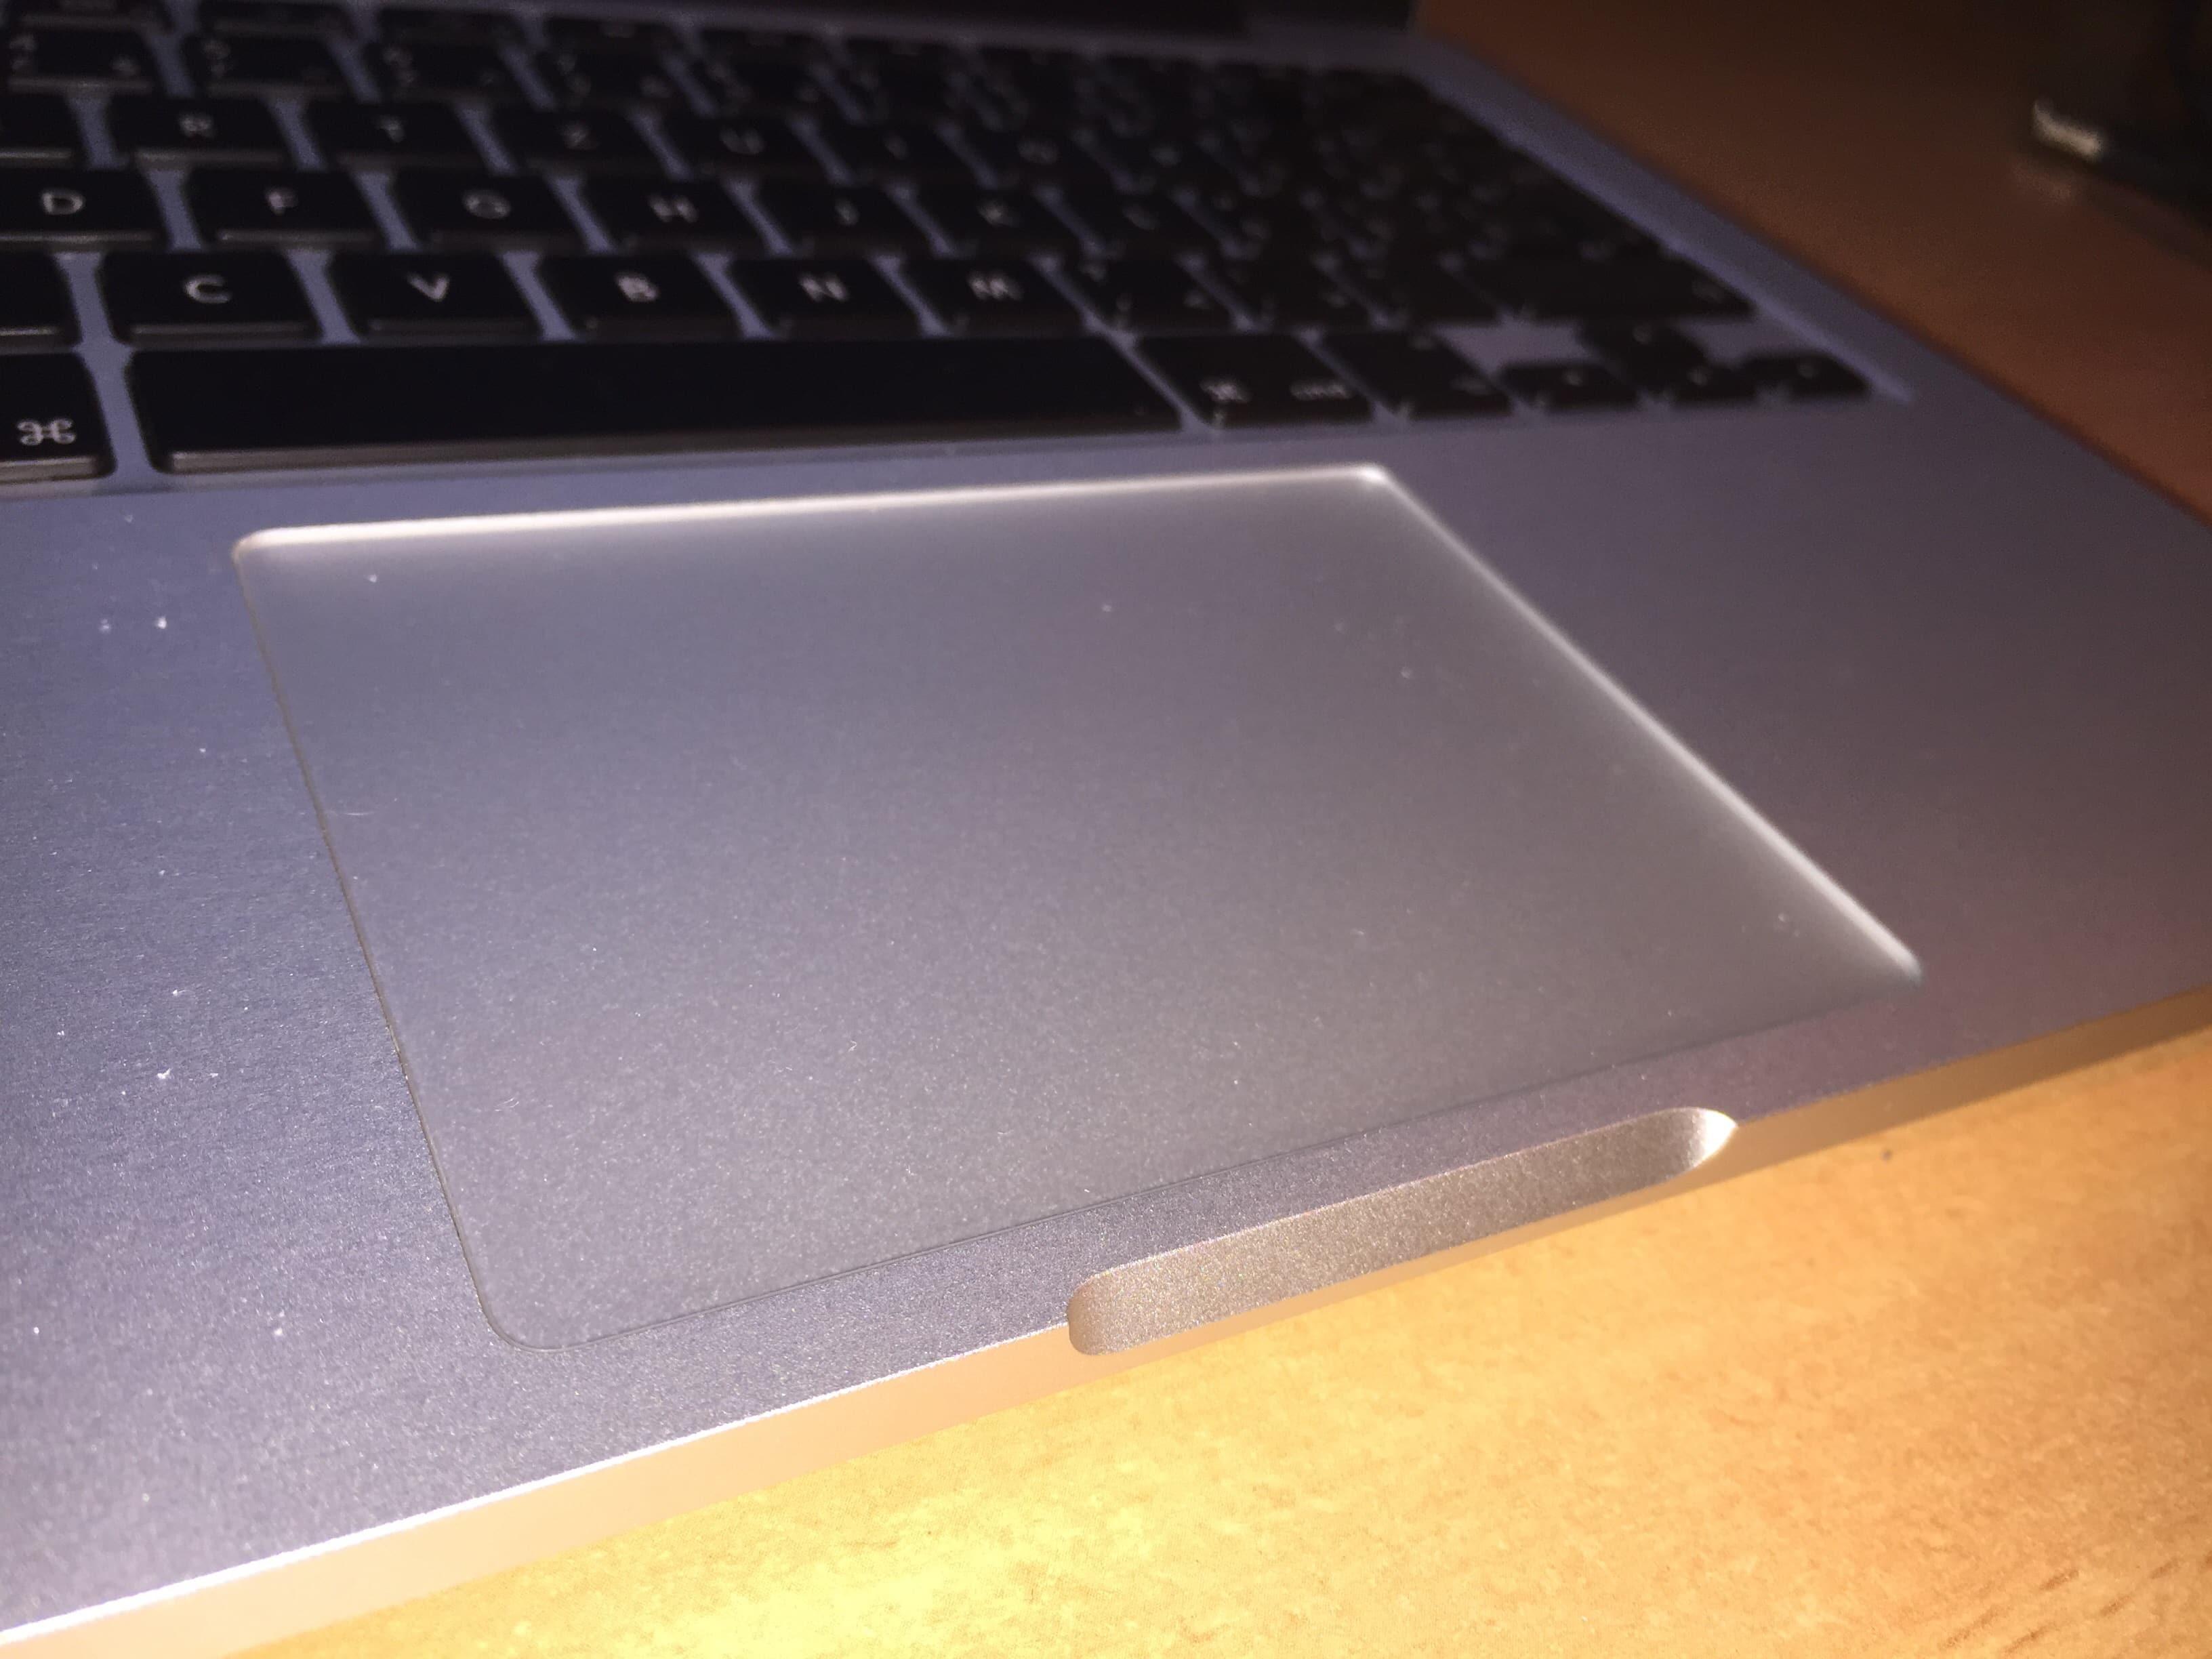 Force Touch Trackpad, je skvelá vec! - svetapple.sk